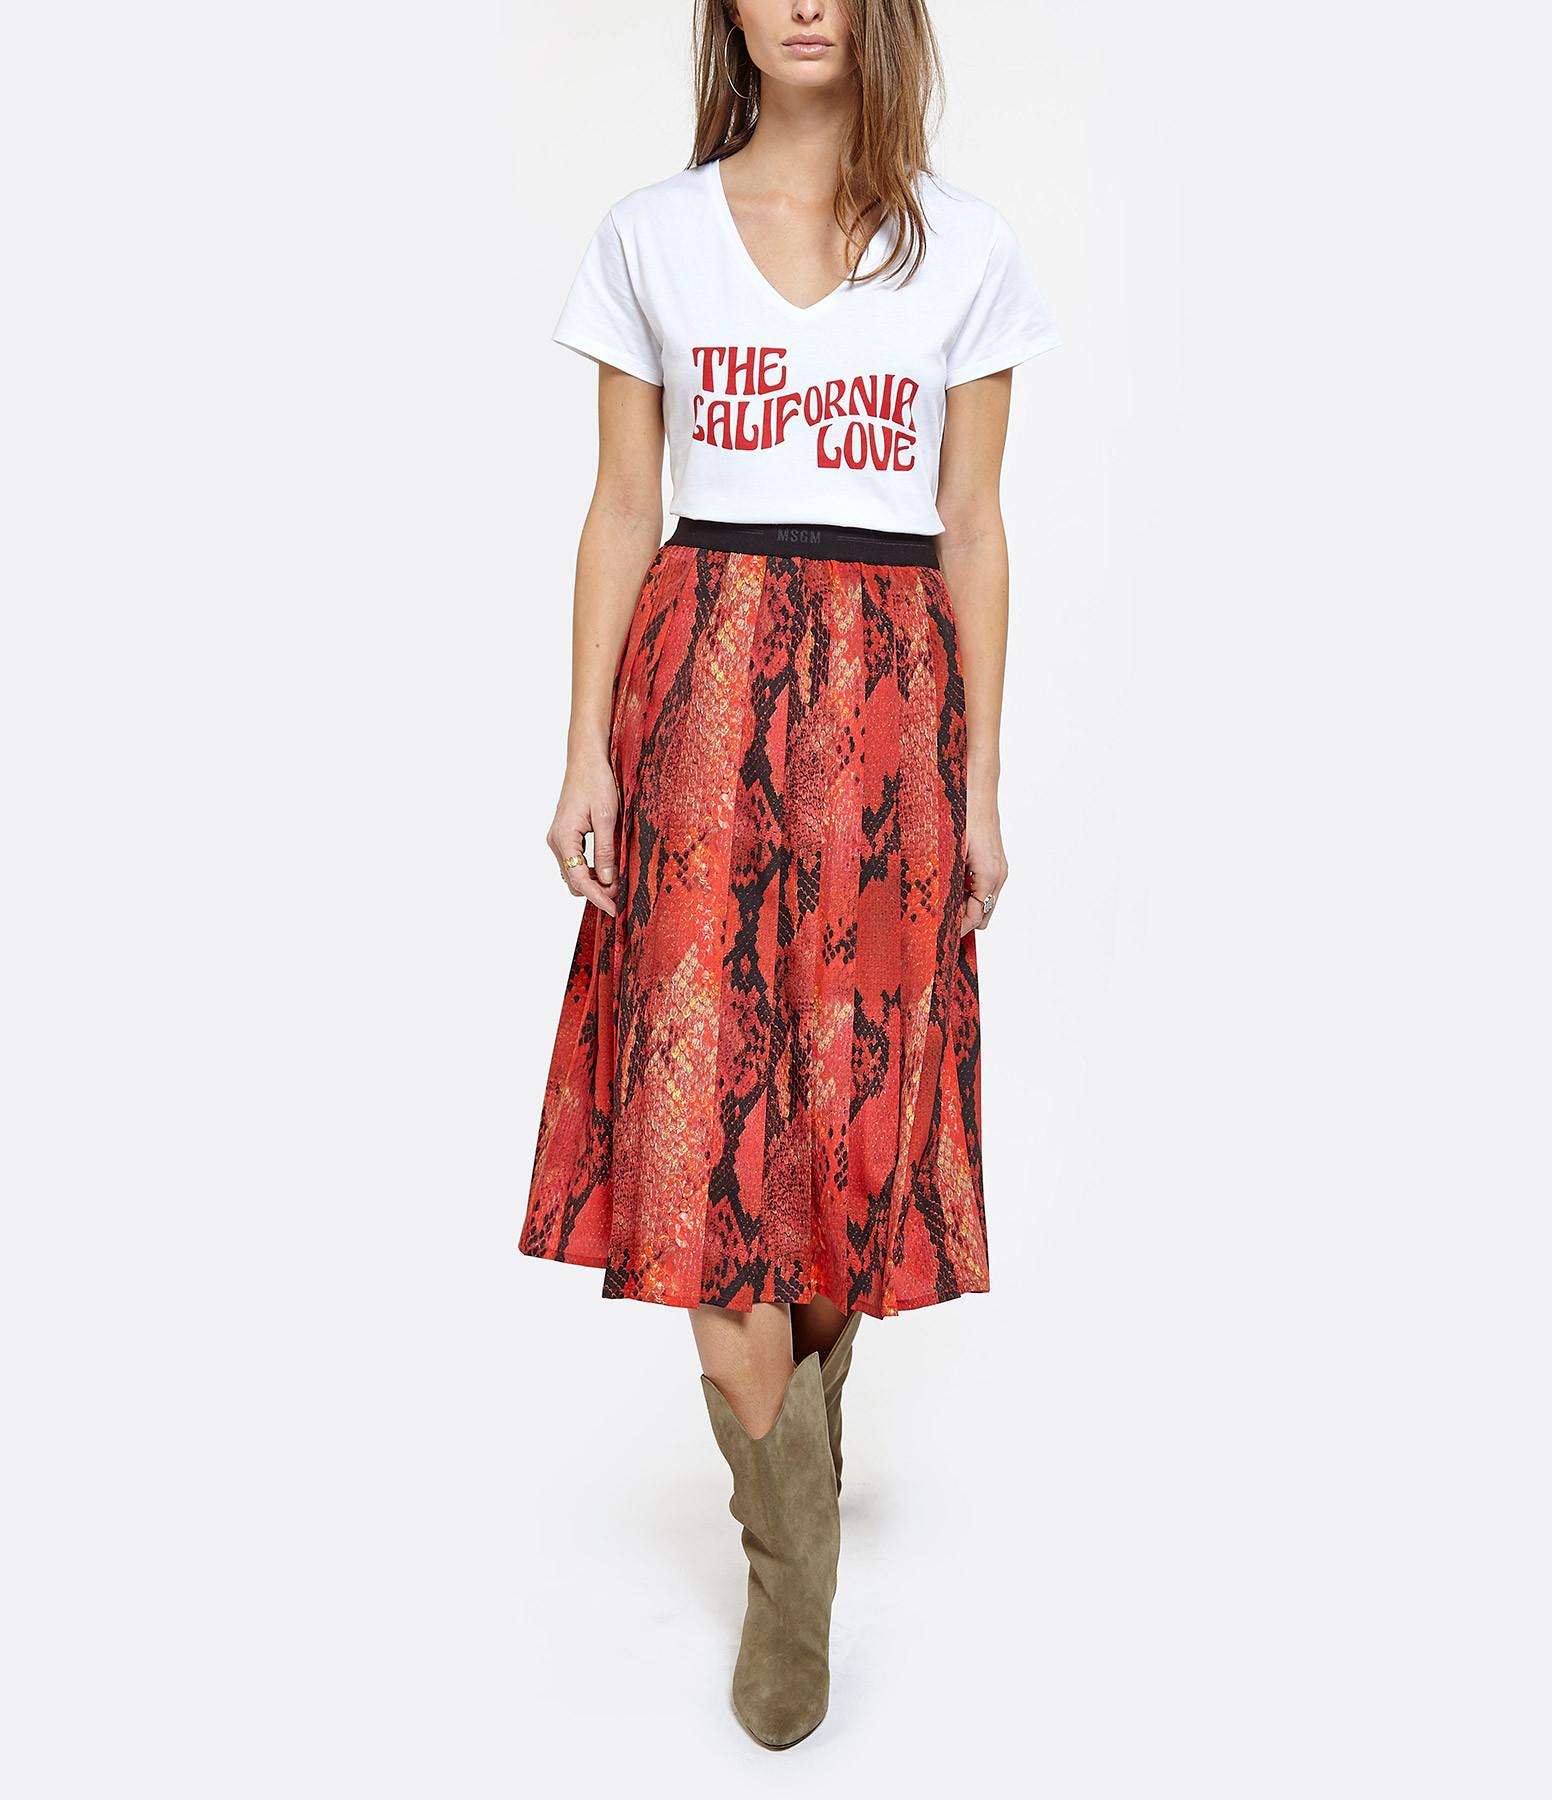 JEANNE VOULAND - Tee-Shirt Dohan California Love Blanc